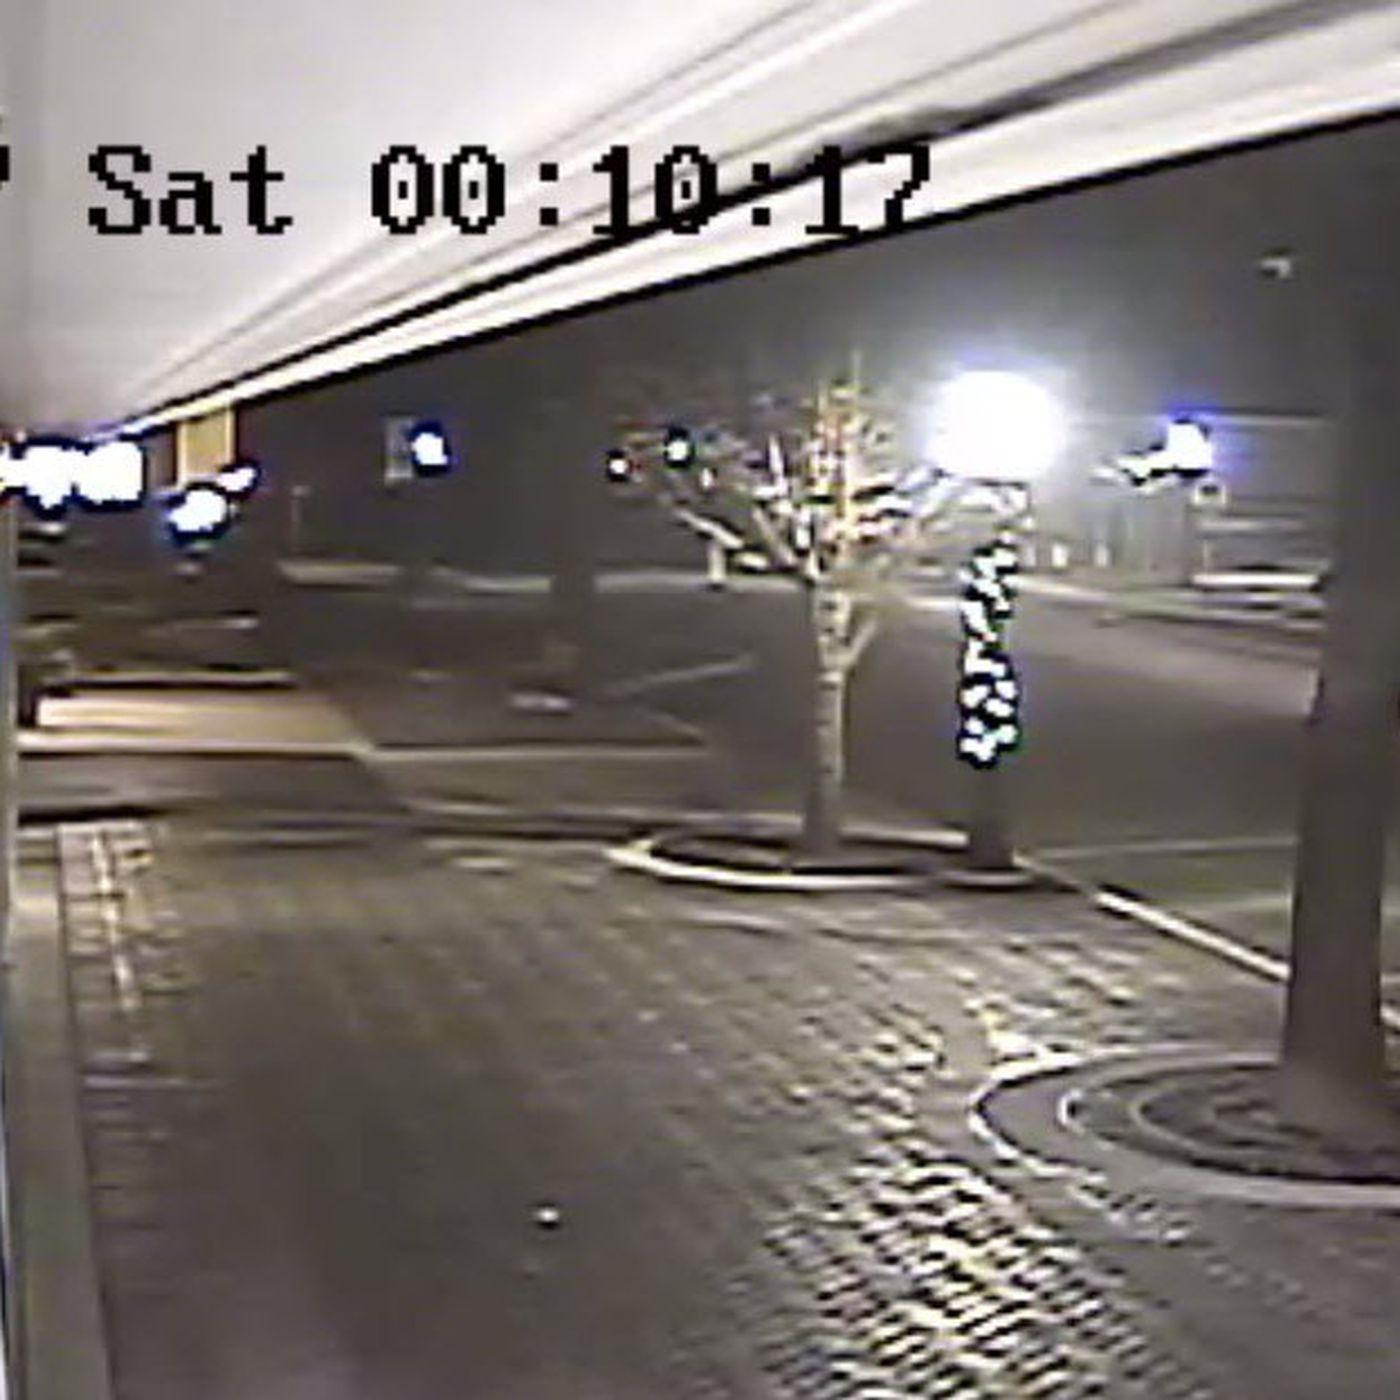 Police release surveillance photos in Riverside shooting